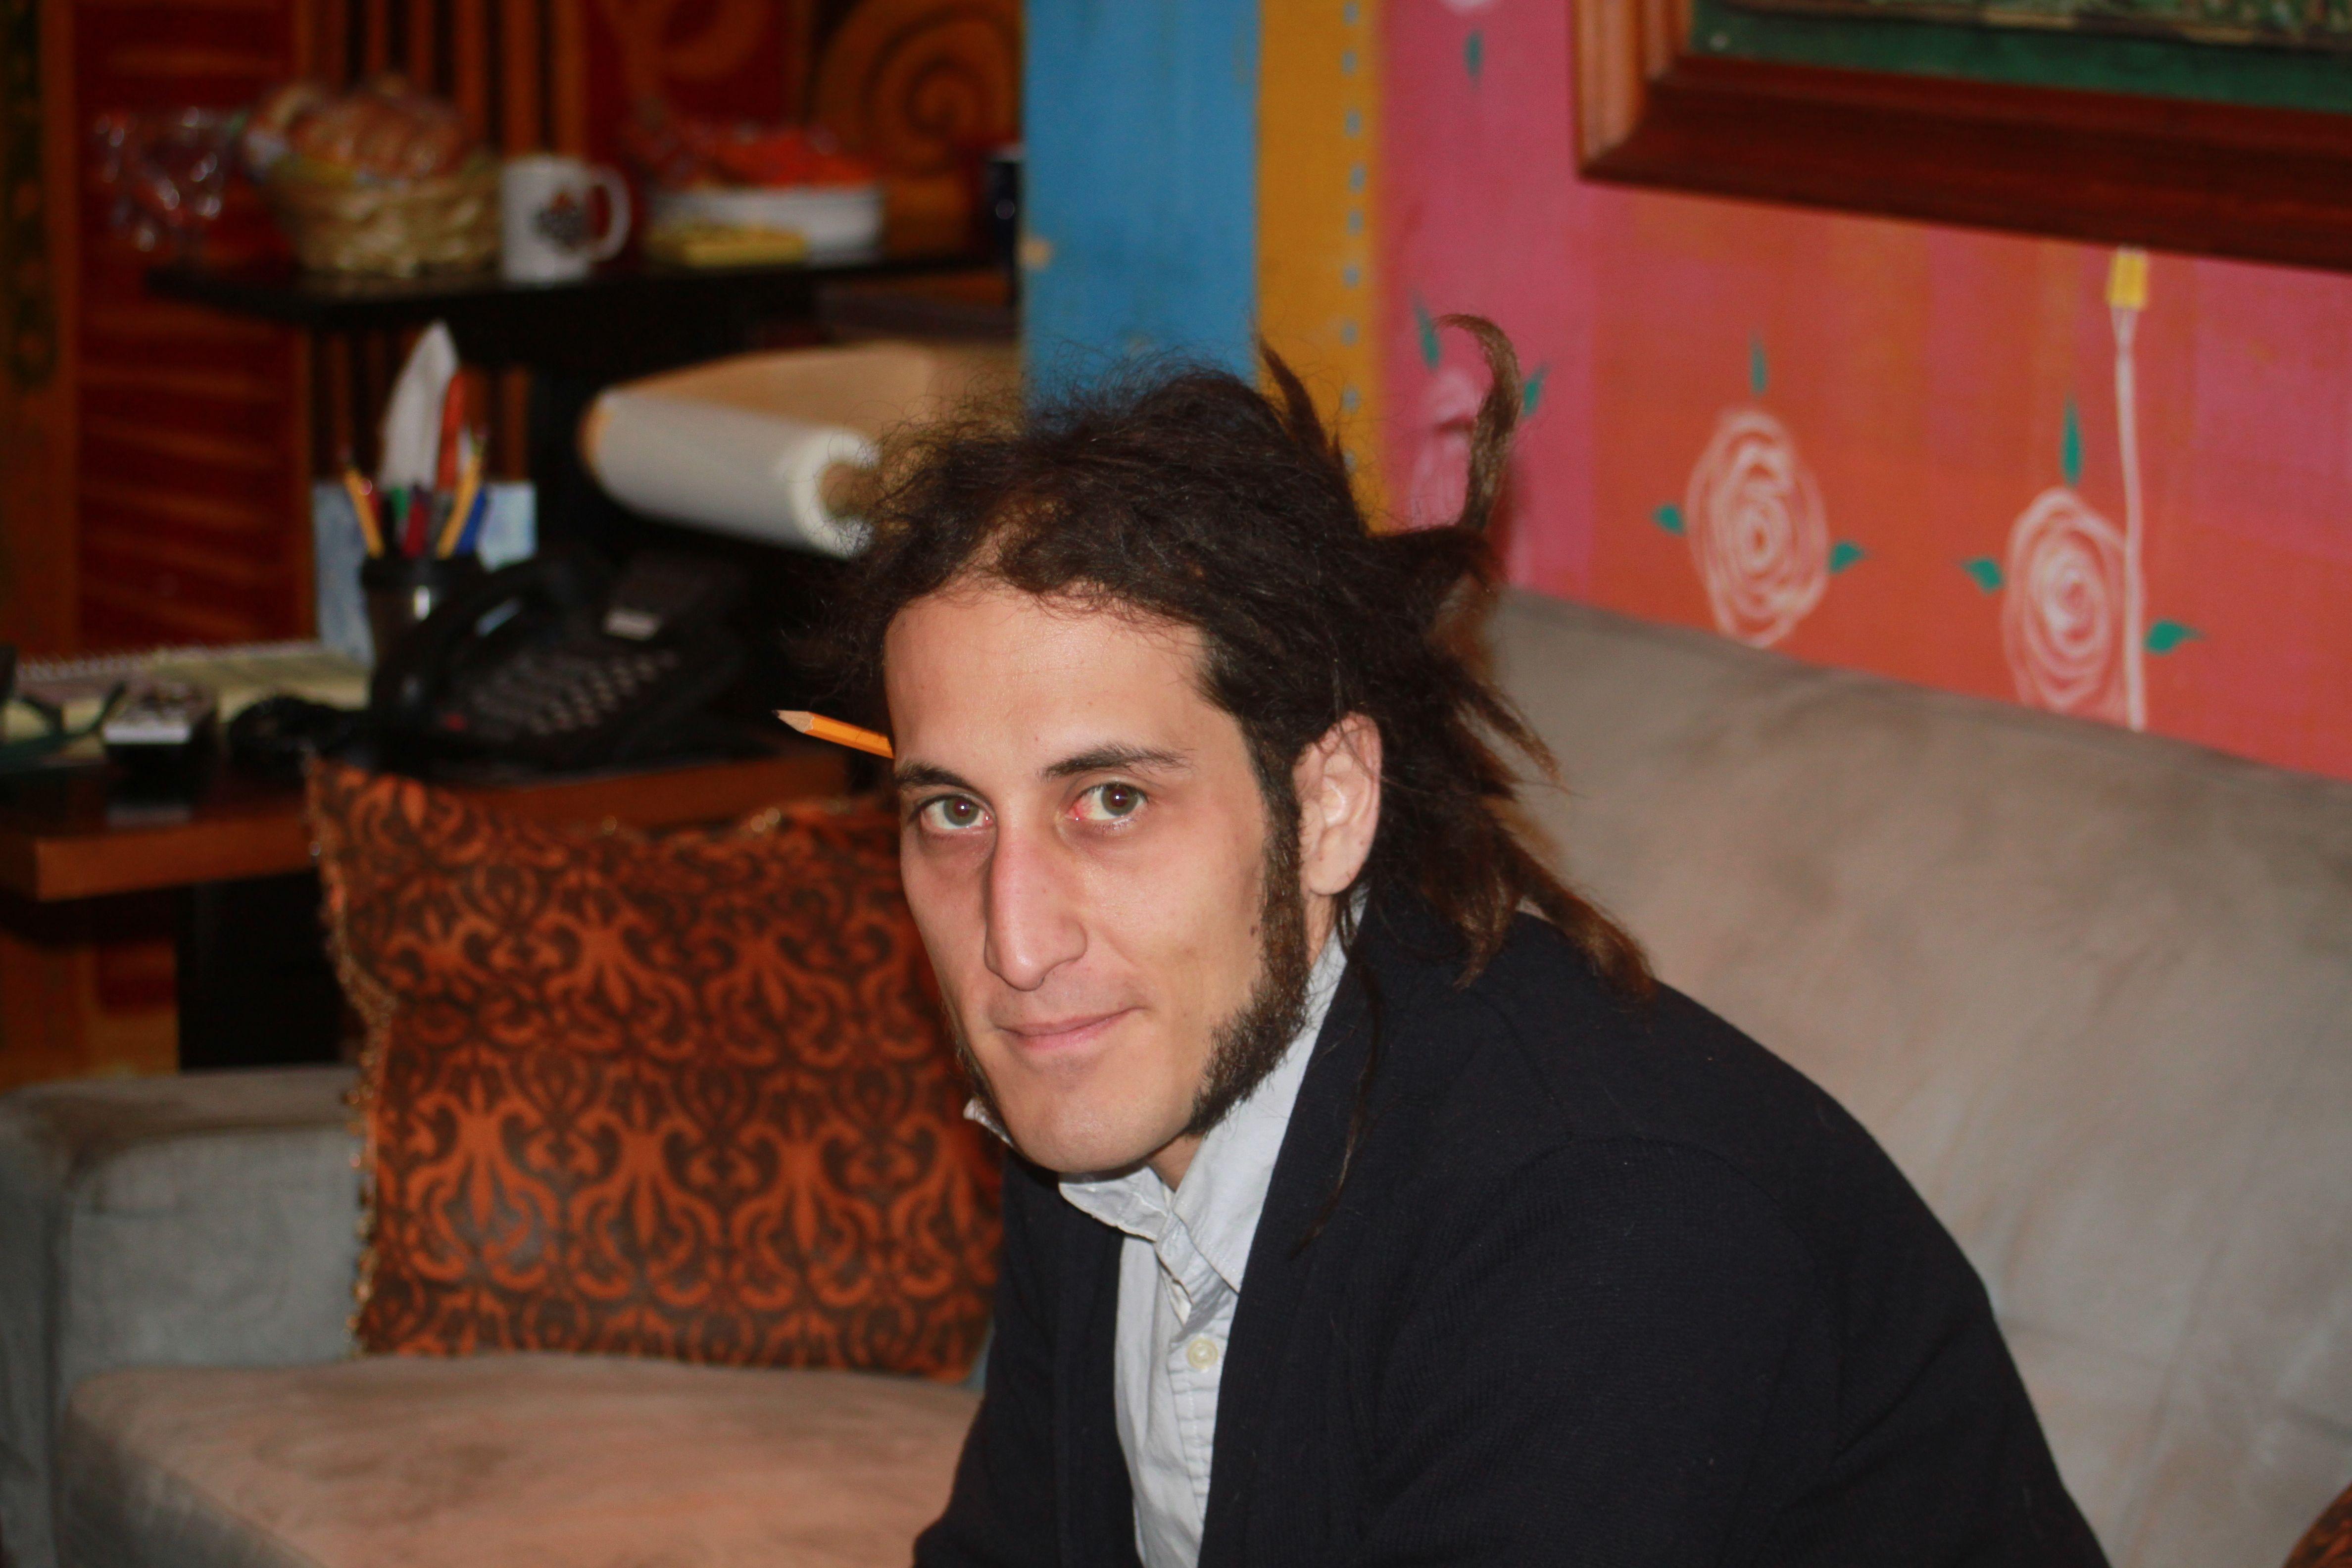 Engineer Samur Khouja